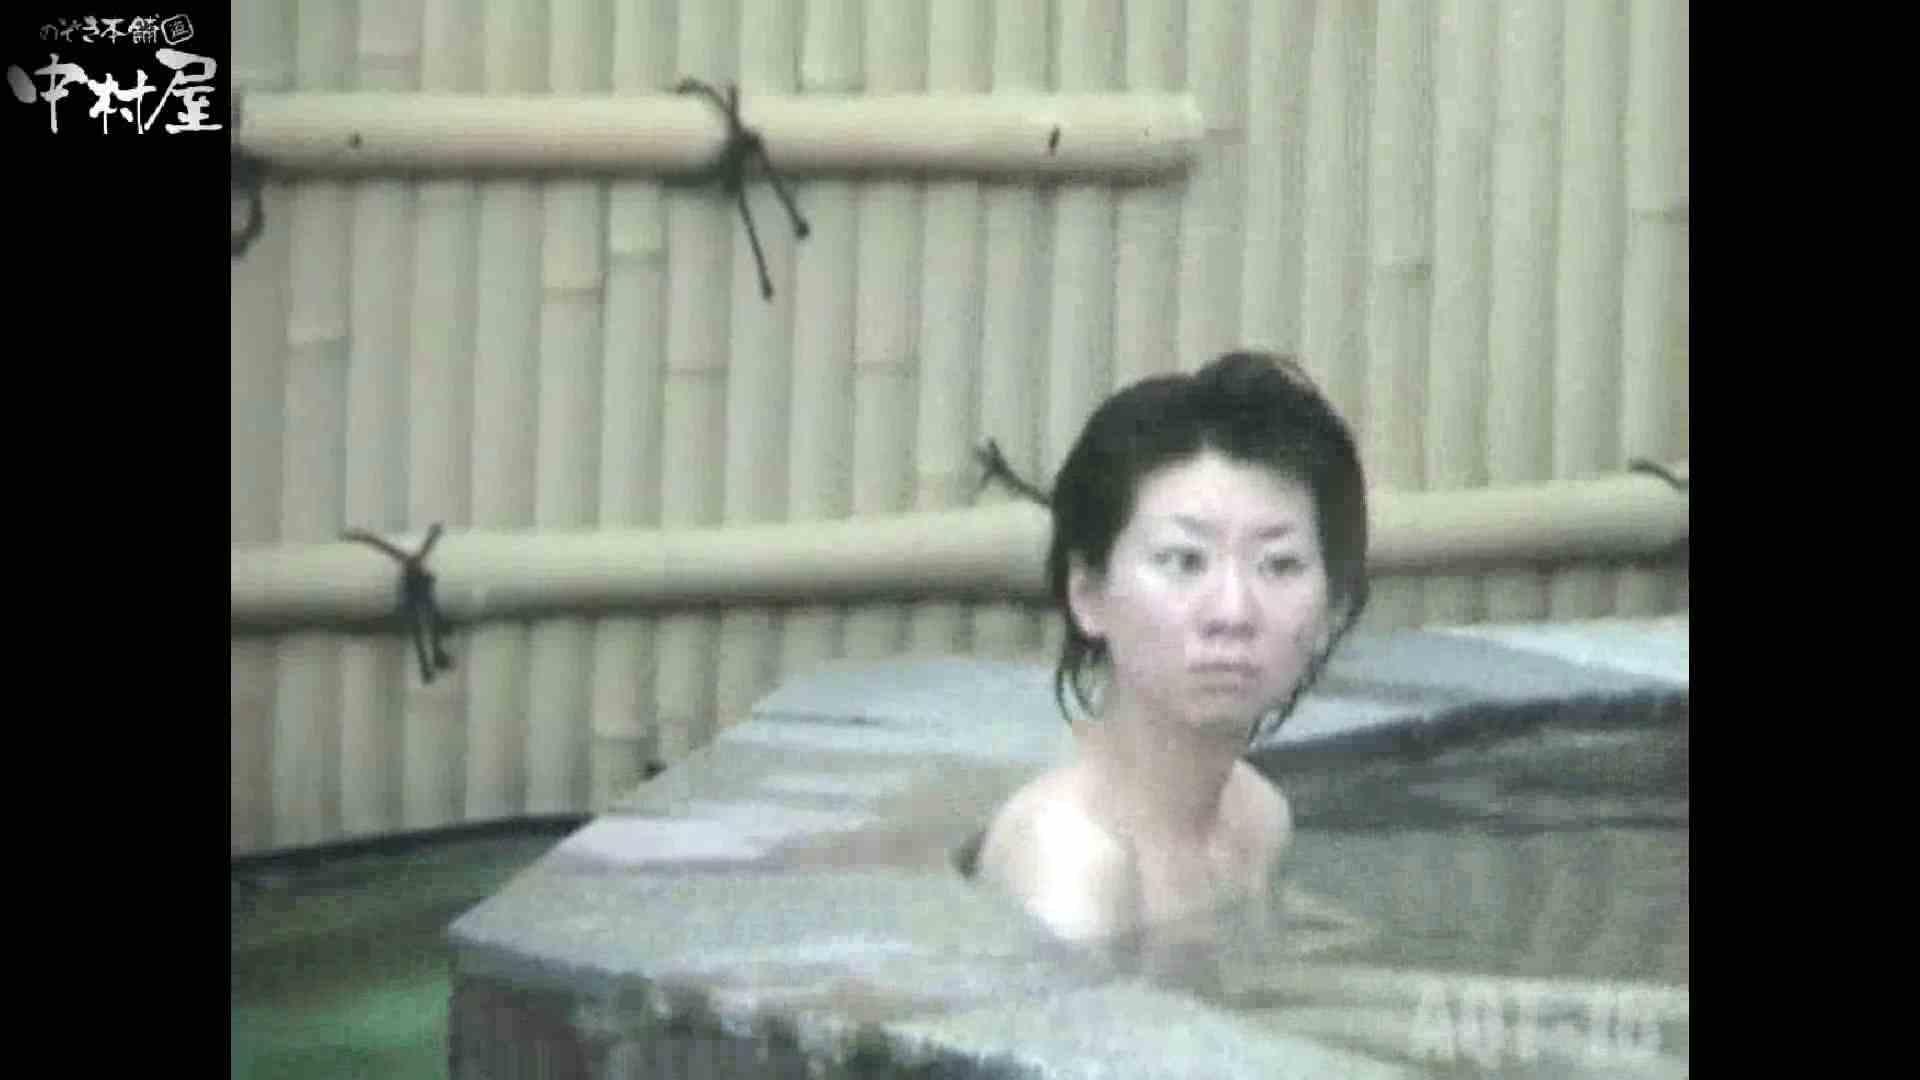 Aquaな露天風呂Vol.880潜入盗撮露天風呂十六判湯 其の三 盗撮師作品 | 美しいOLの裸体  100pic 69